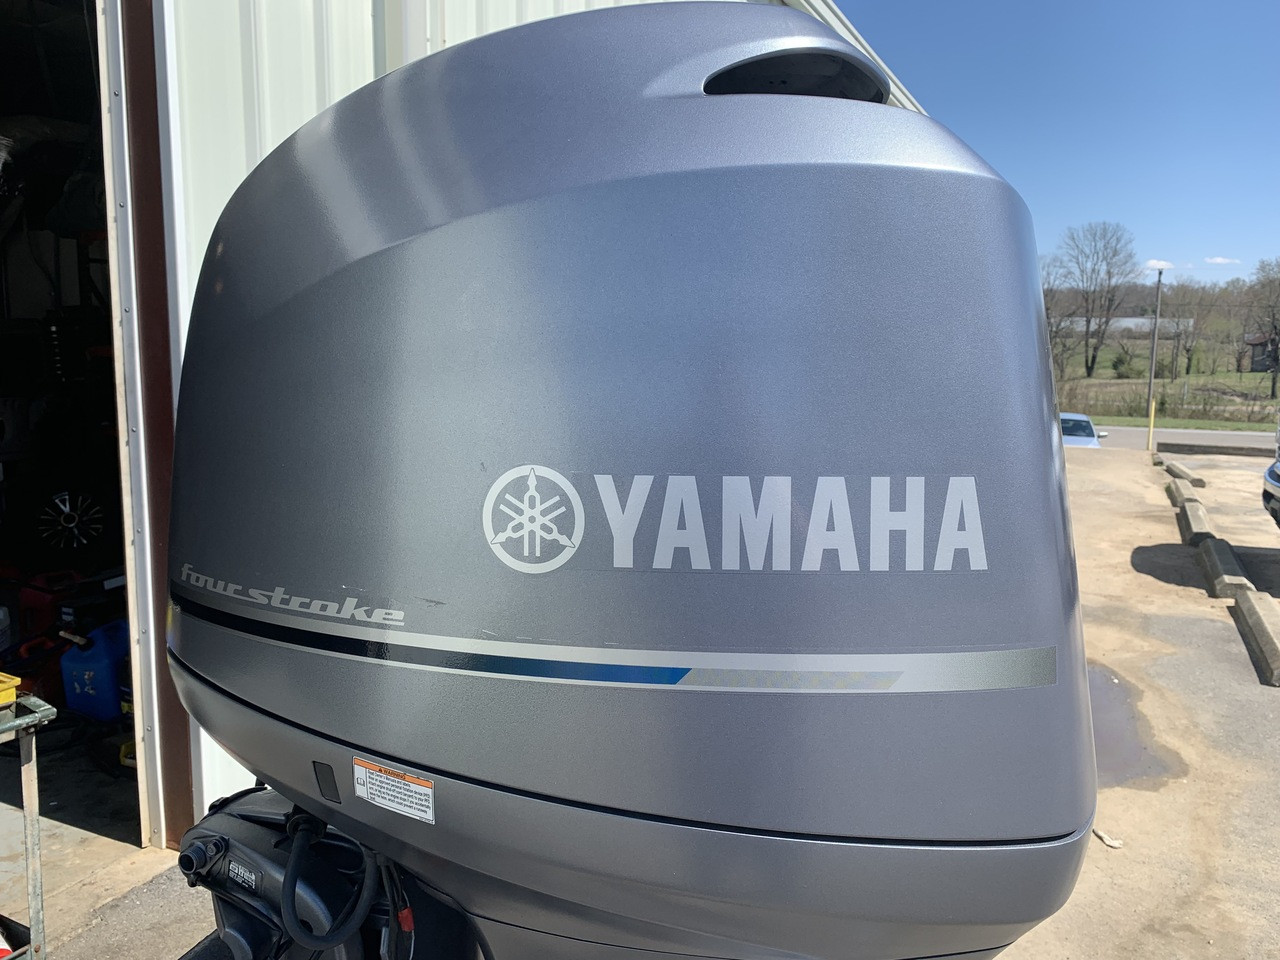 "2011 Yamaha 150 HP 4 Cylinder EFI 4 Stroke 20"" Outboard Motor"